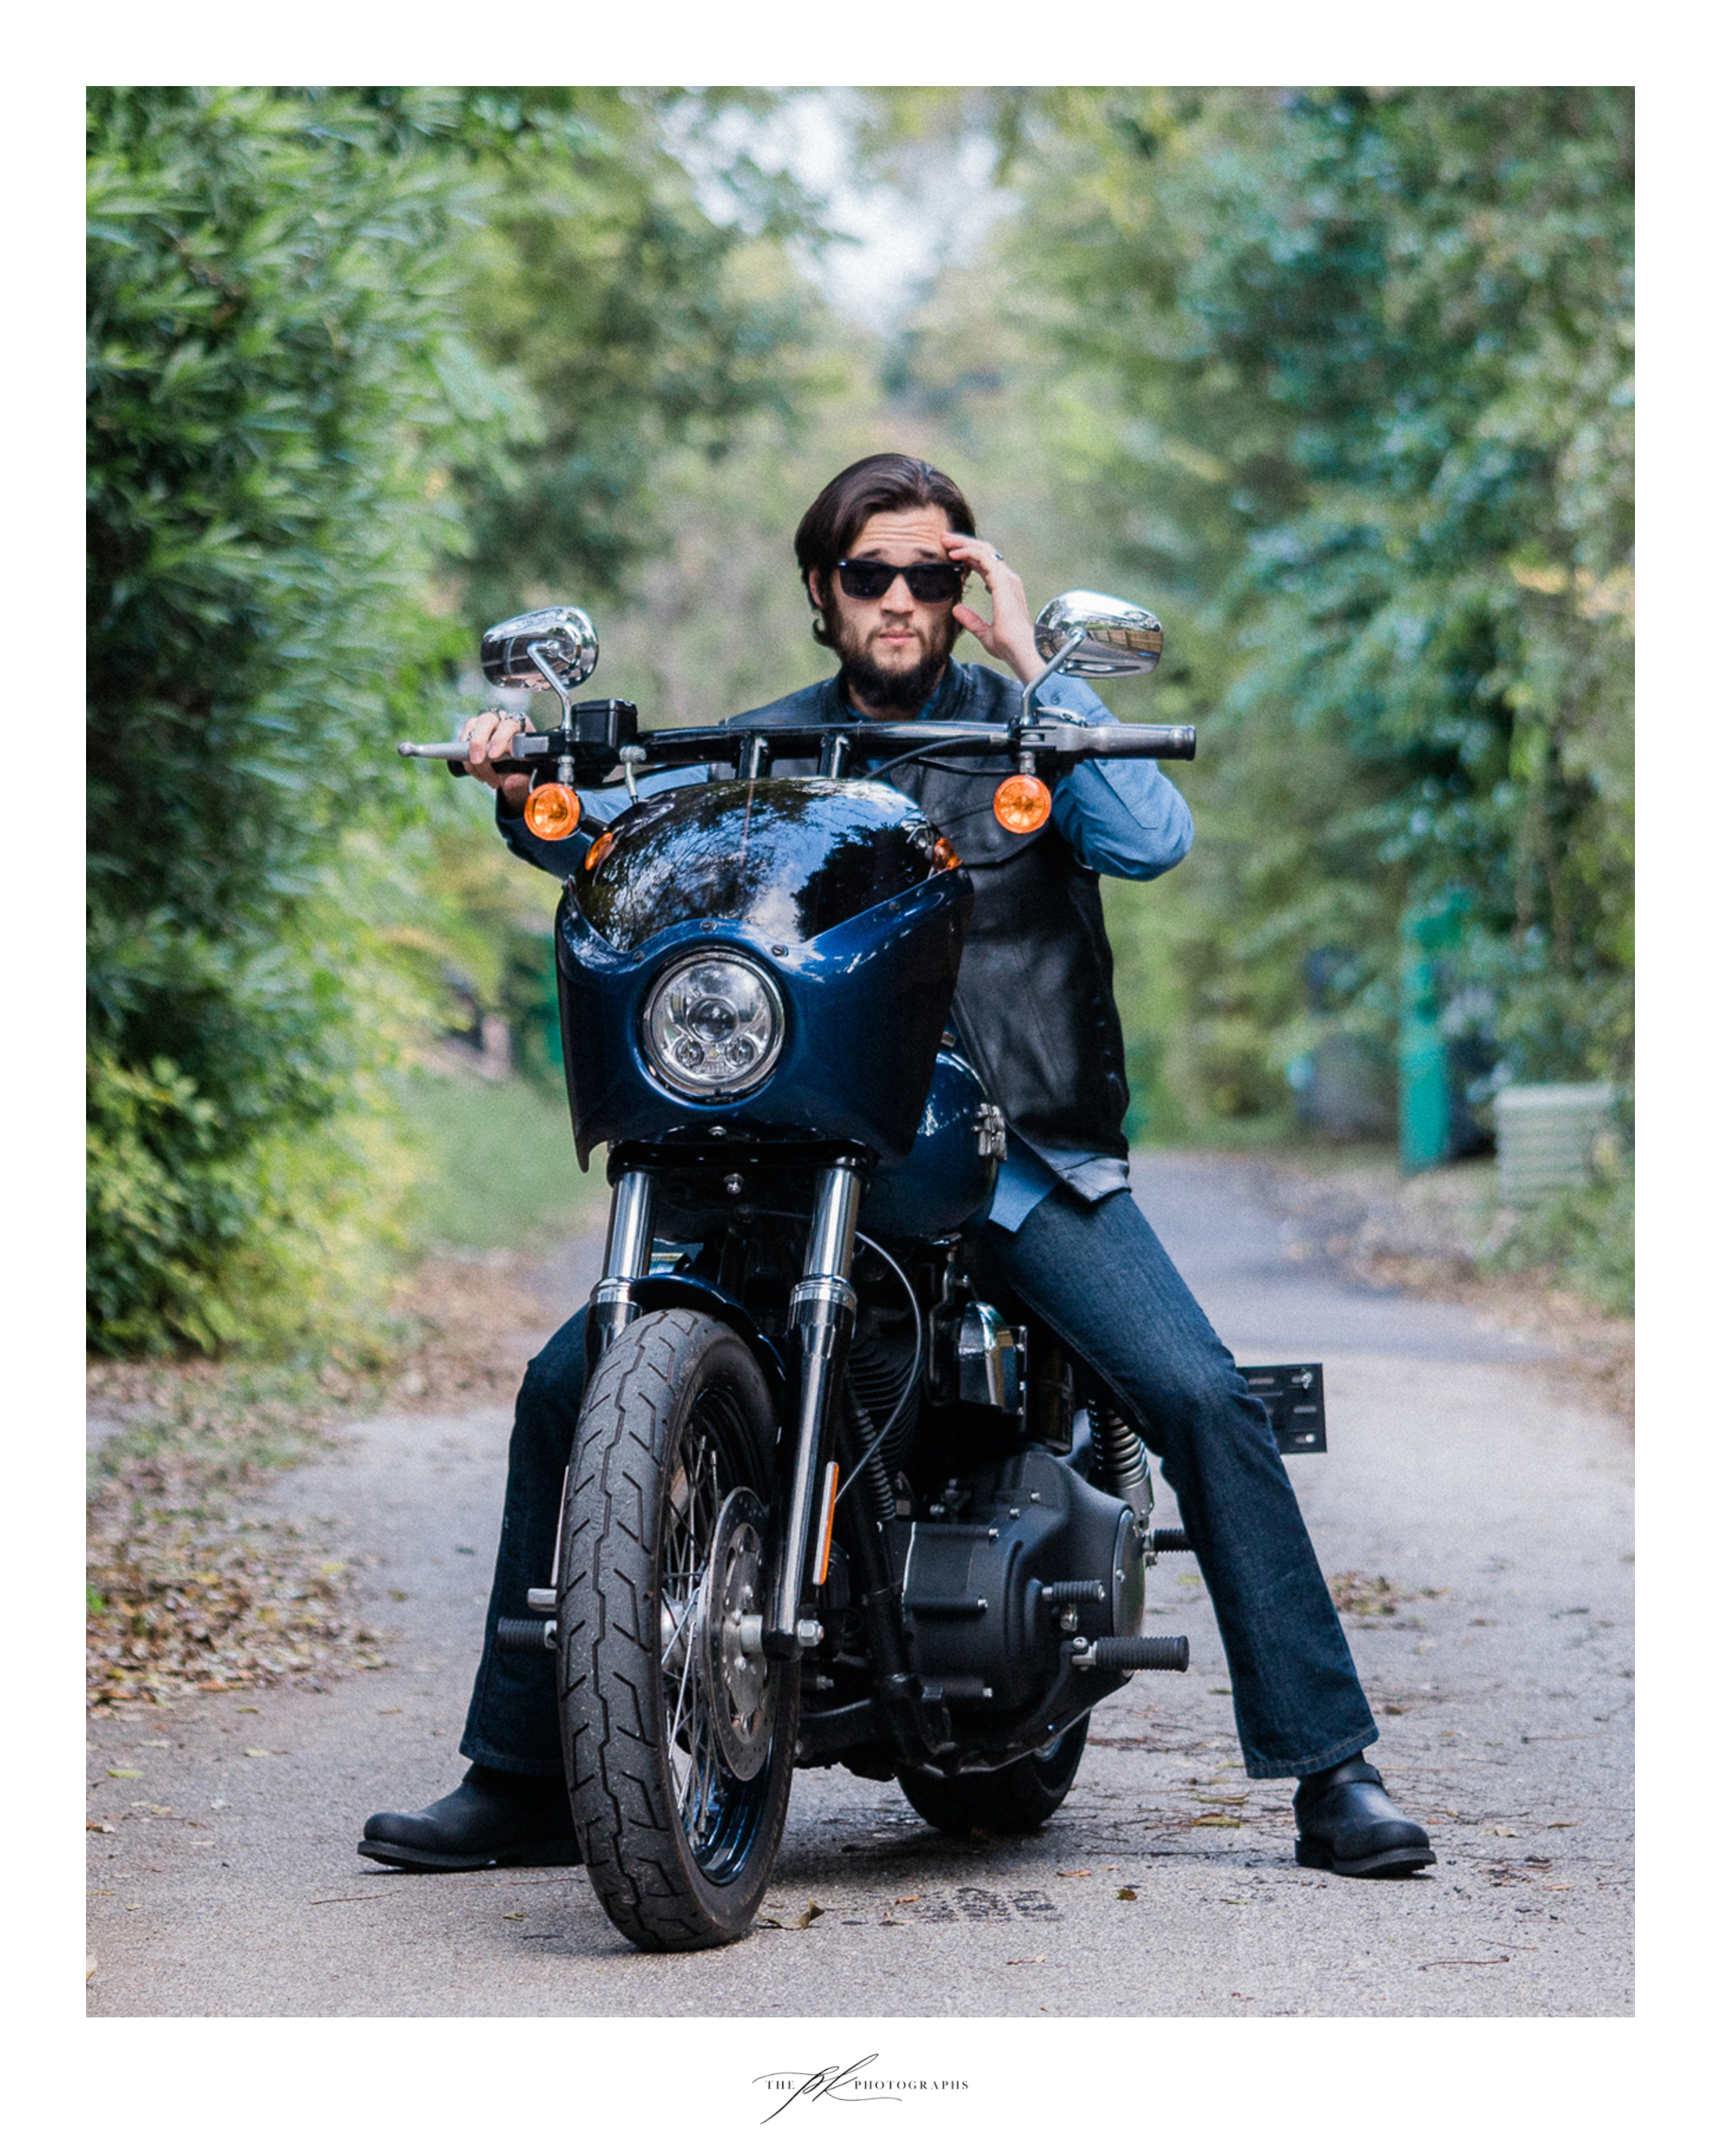 Moe during his custom Harley-Davidson portrait session in San Antonio